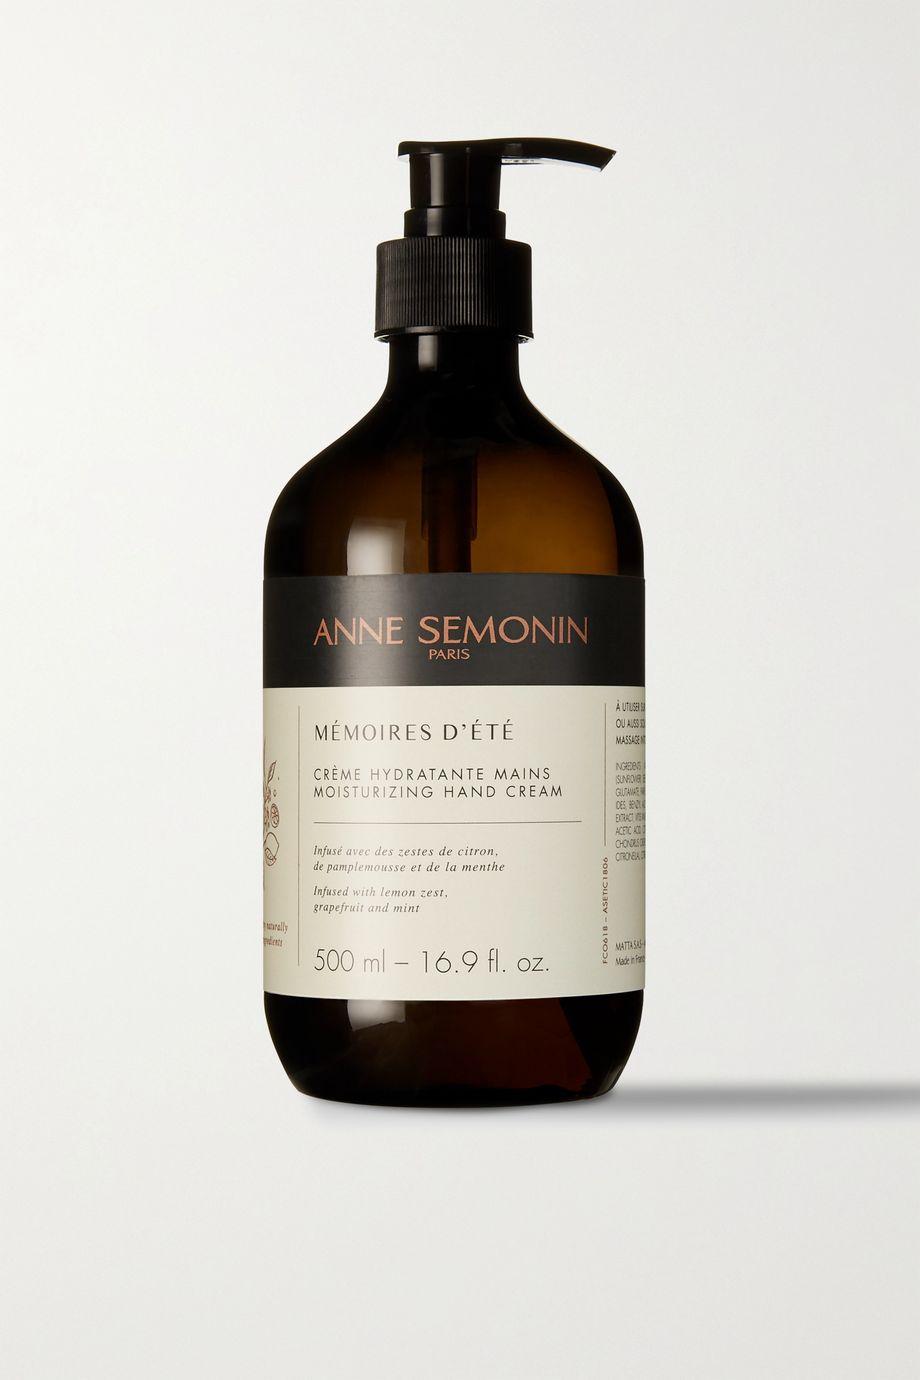 Anne Semonin Mémoires d'Été Moisturizing Hand Cream, 500 ml – Handcreme